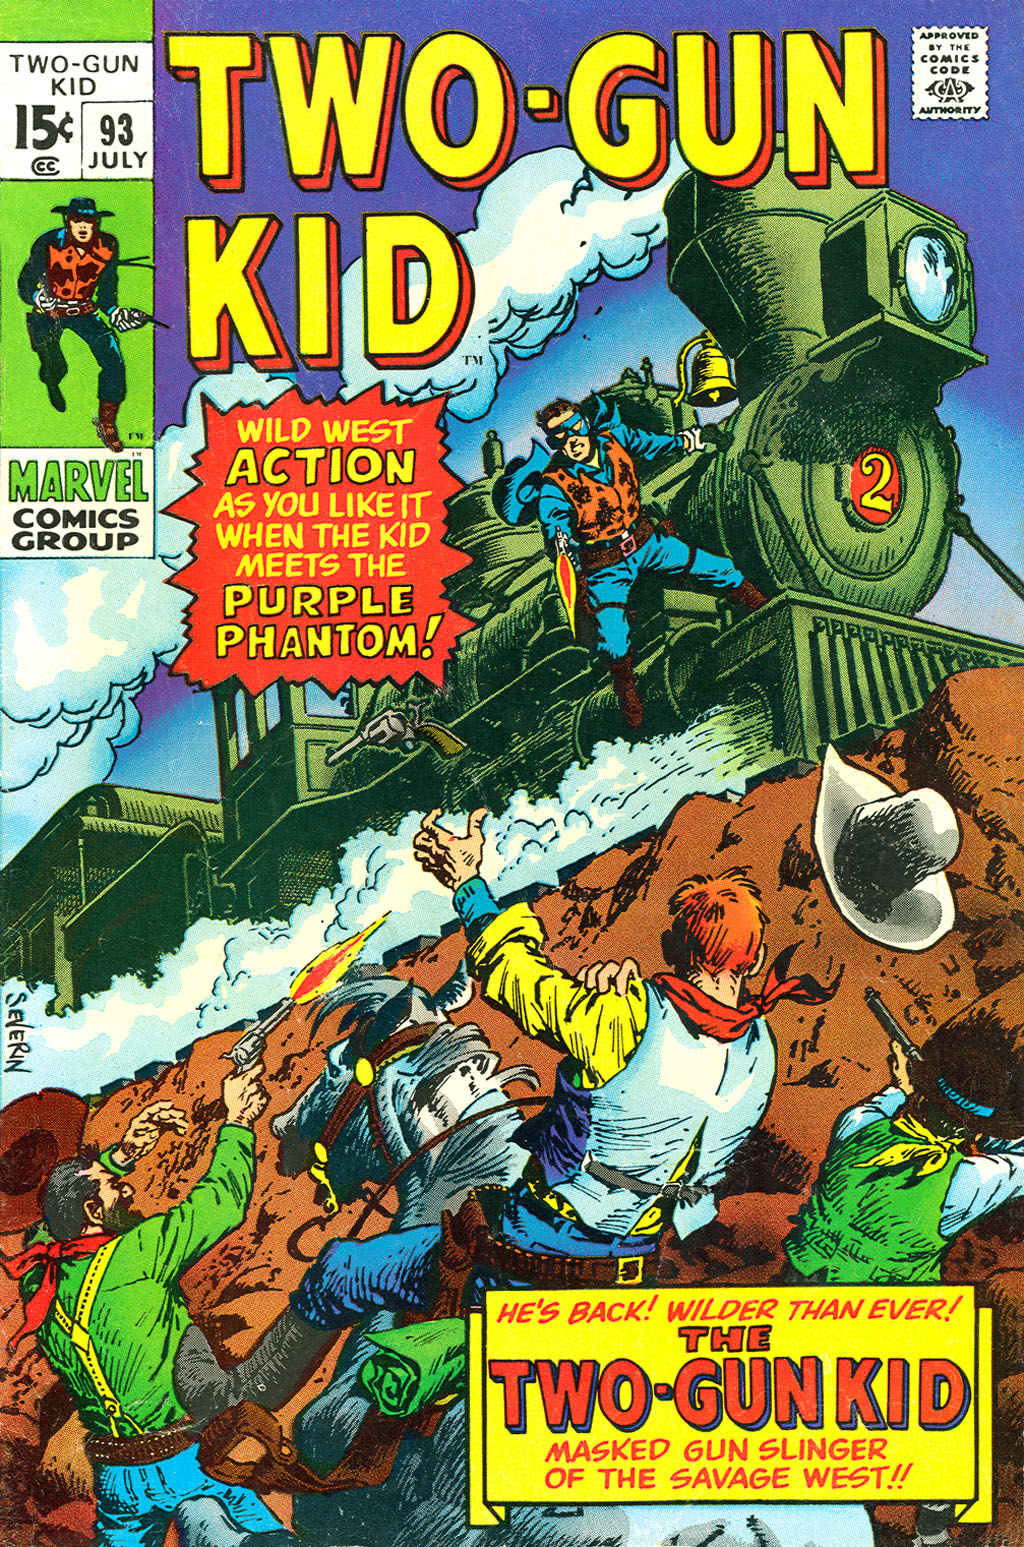 Read online Two-Gun Kid comic -  Issue #93 - 1